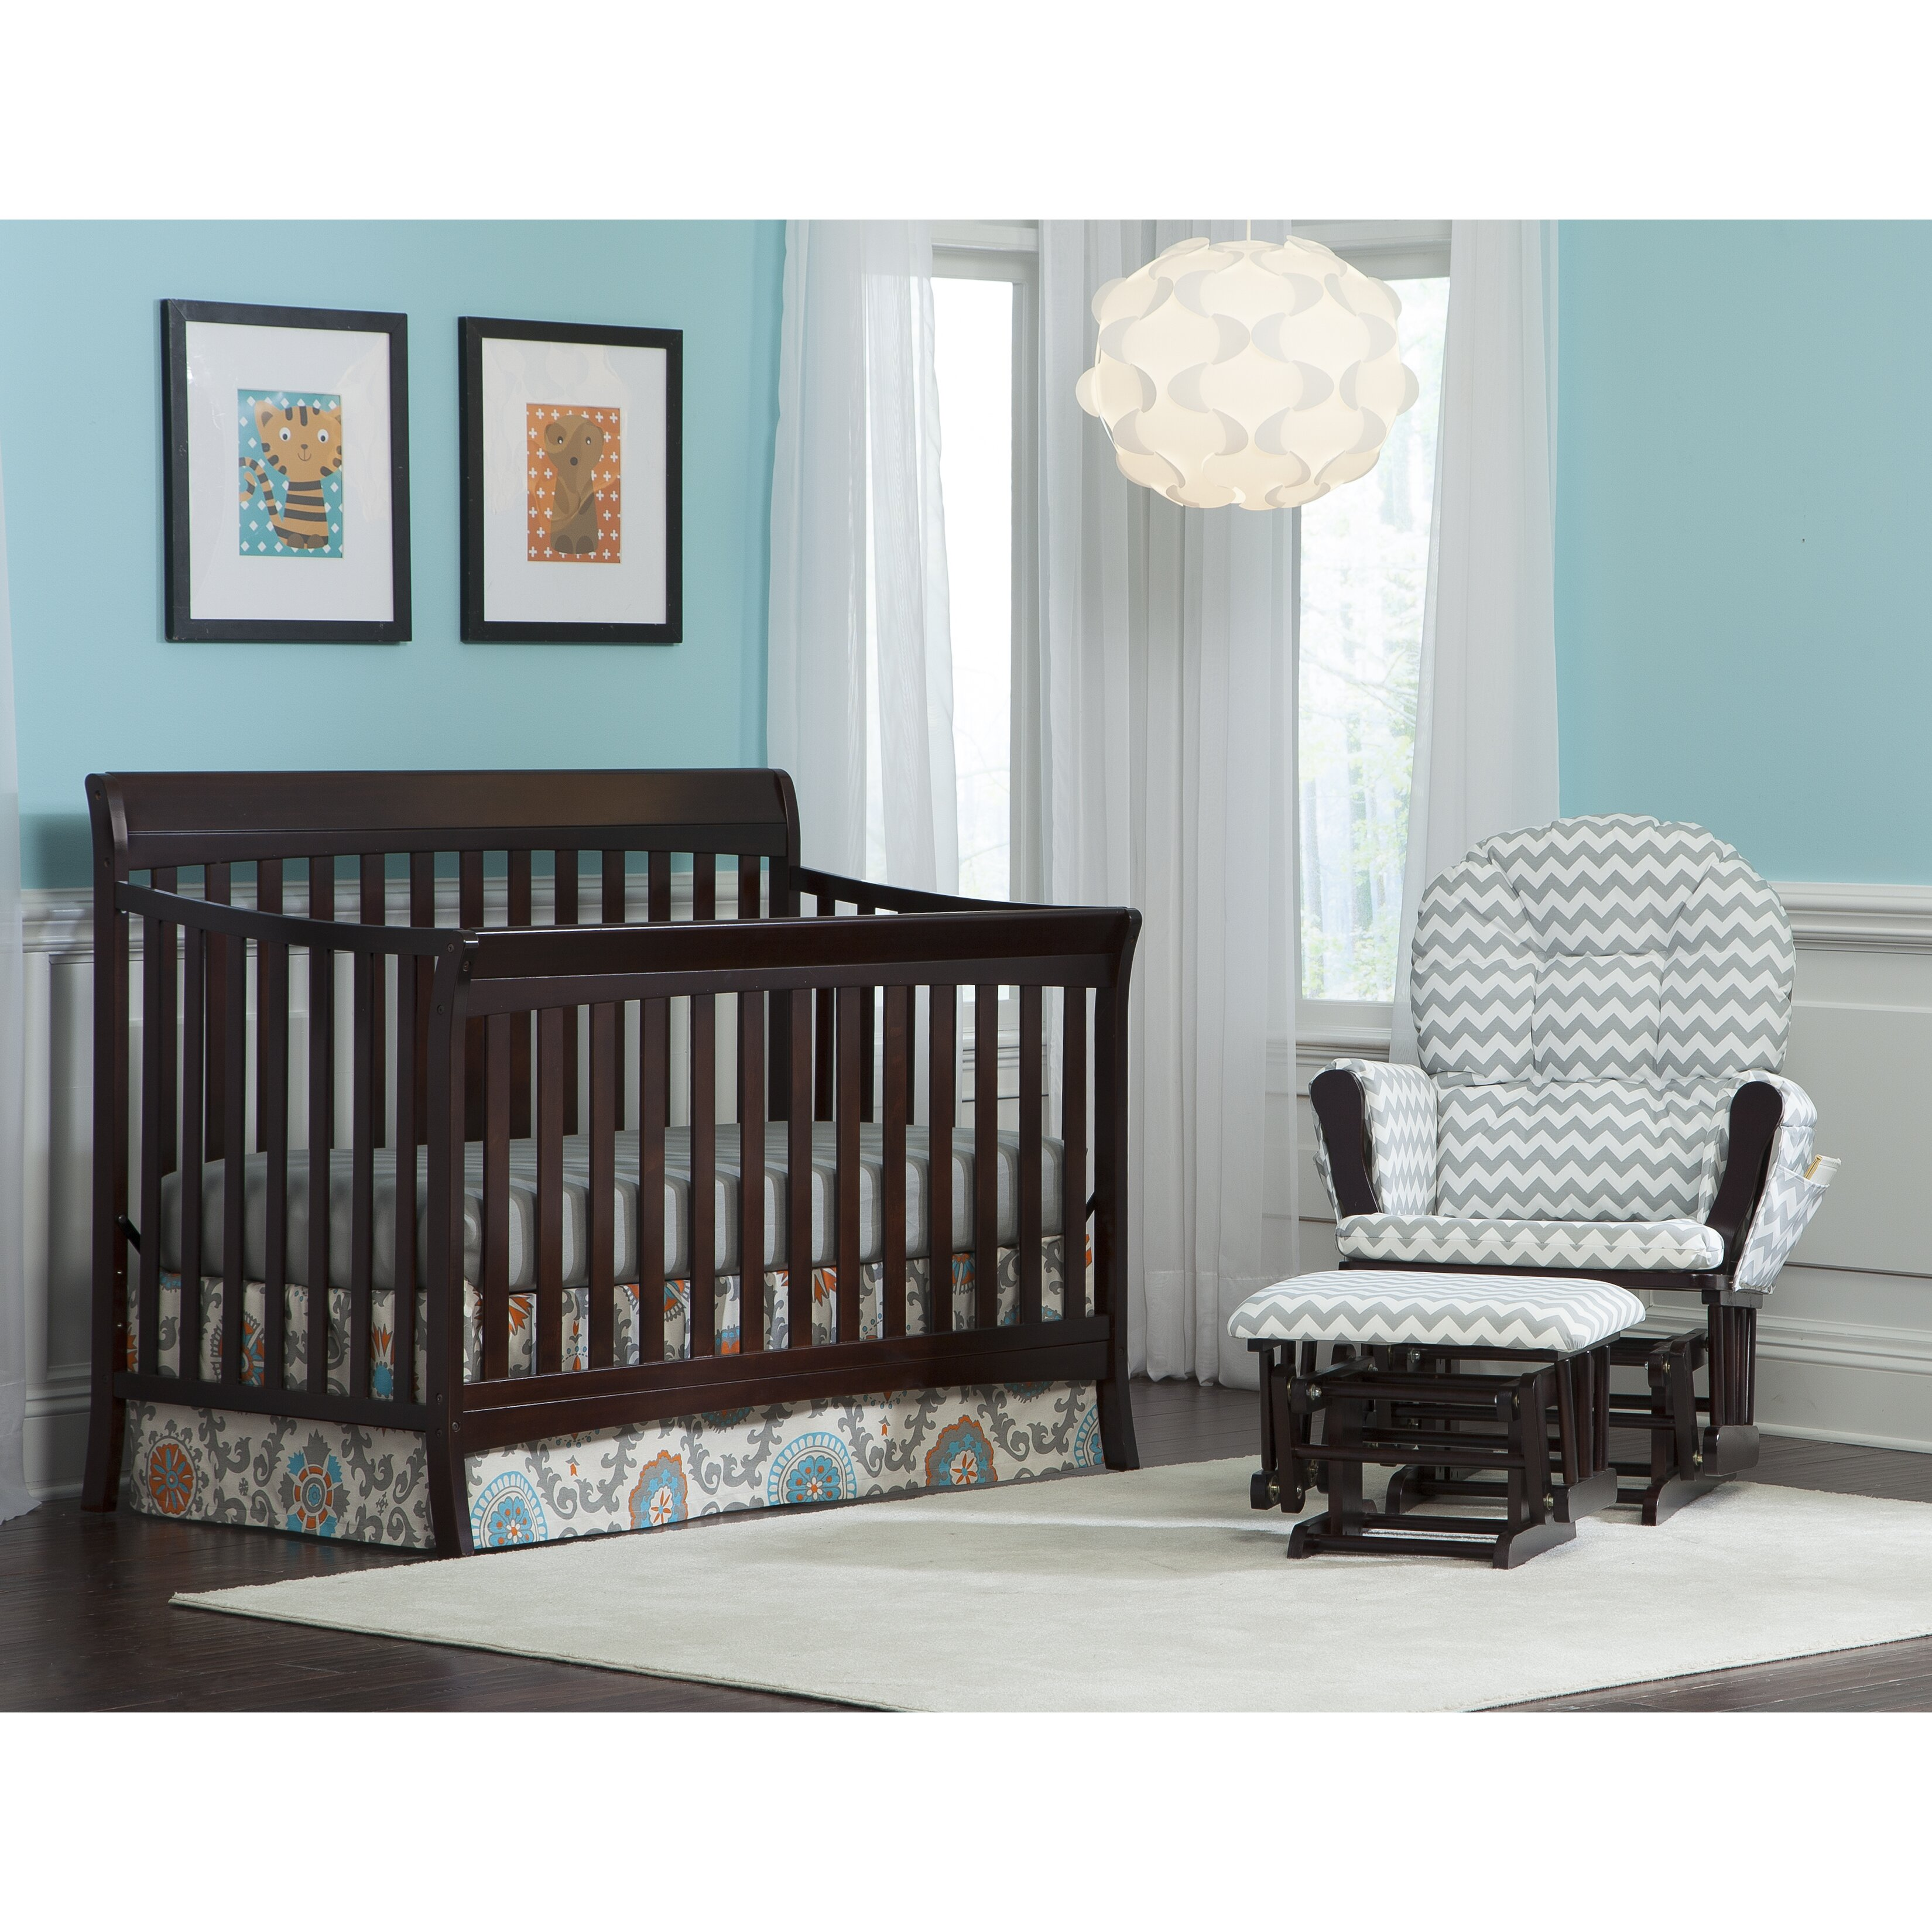 Jardine crib for sale - Storkcraft Avalon 4in1 Convertible Crib